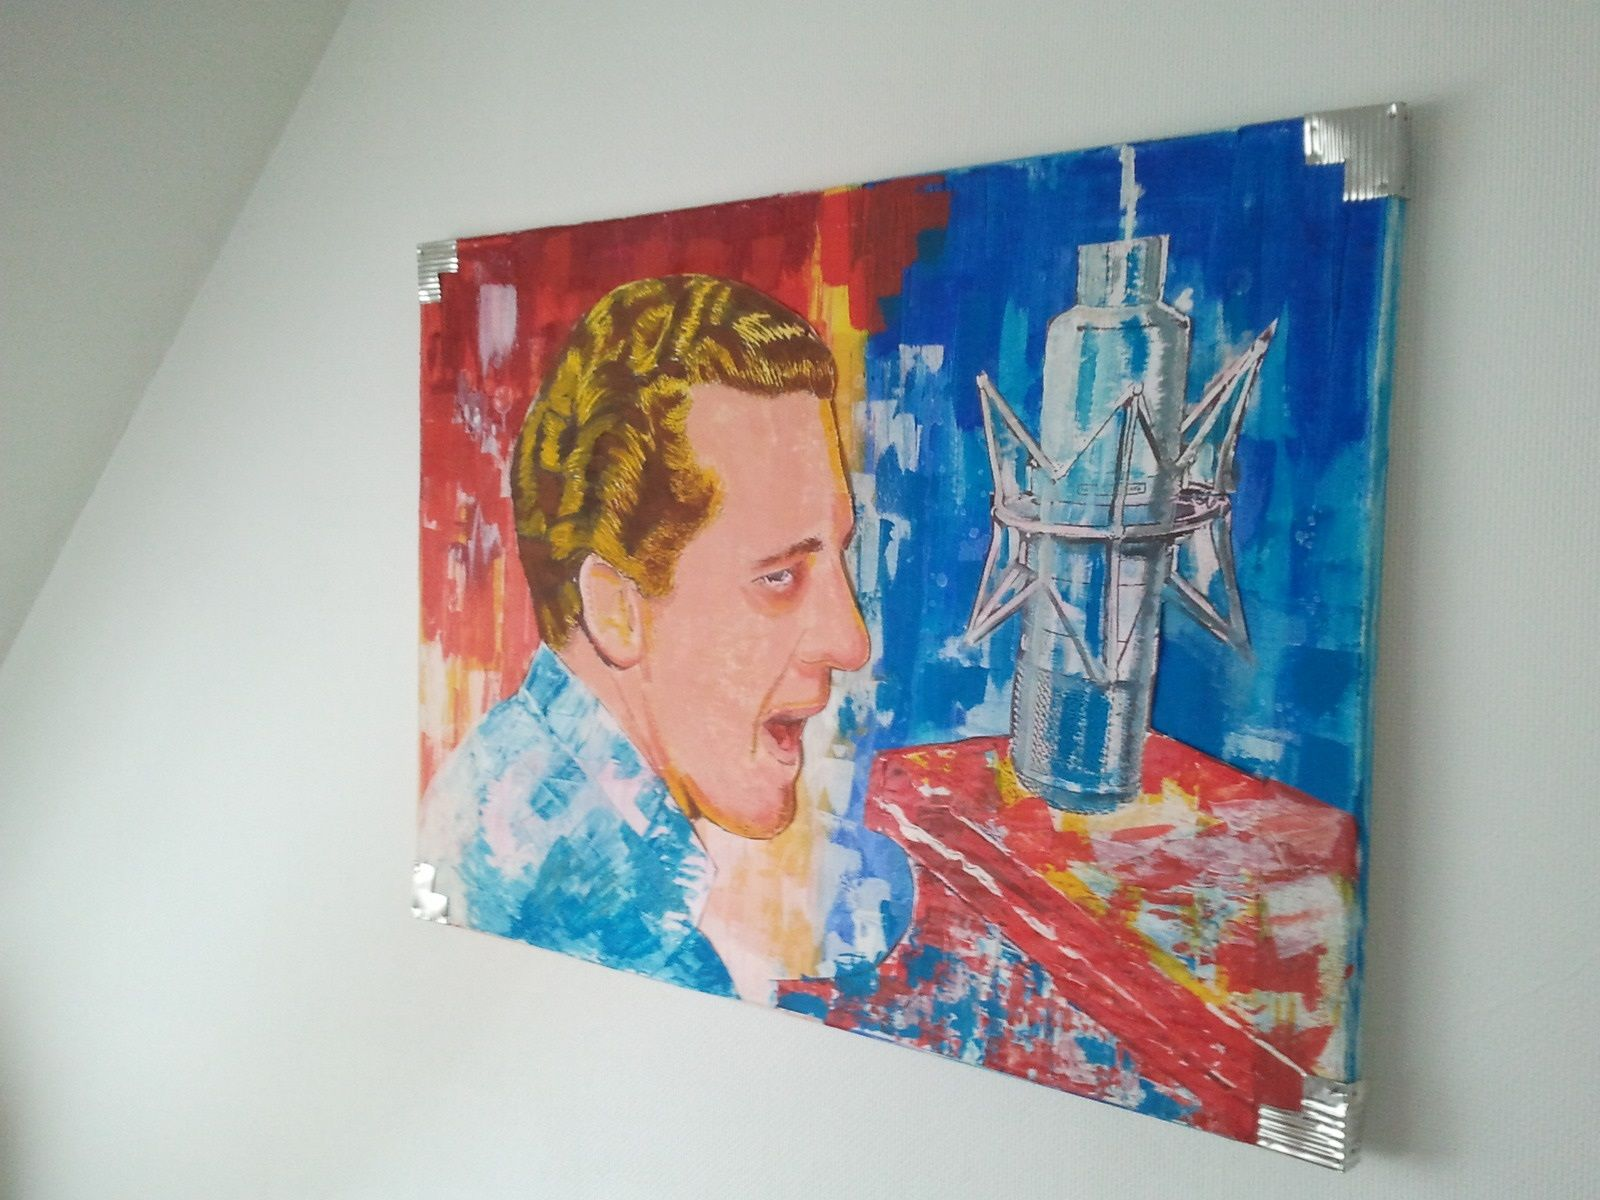 Jerry Lee Lewis King Of Rock N Roll Pop Art Gemälde Pop